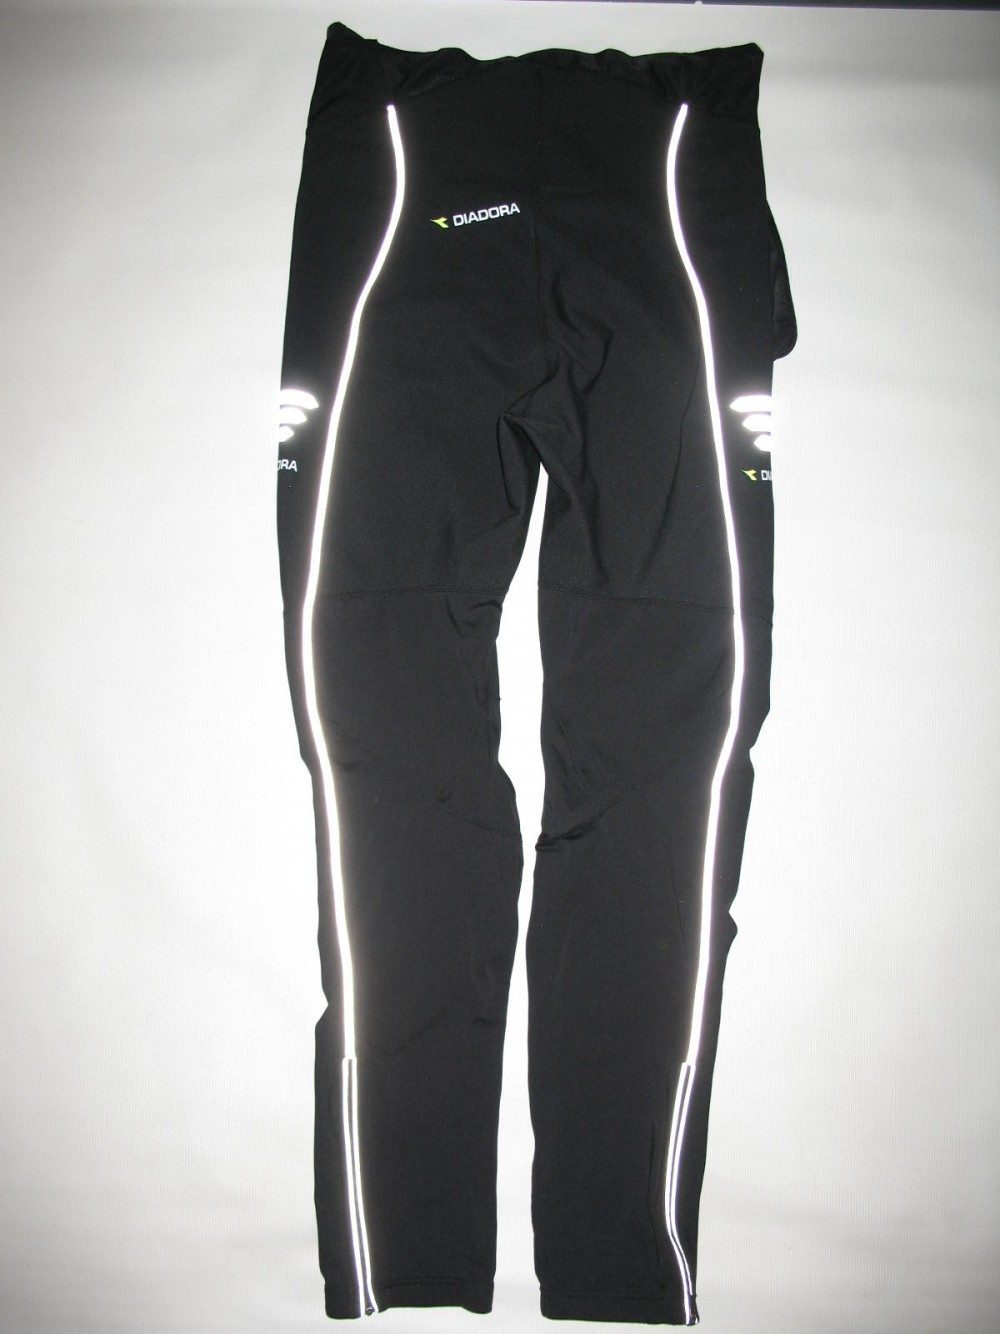 Велобрюки DIADORA cycling windstopper bib pants(размер XL/реально L) - 2